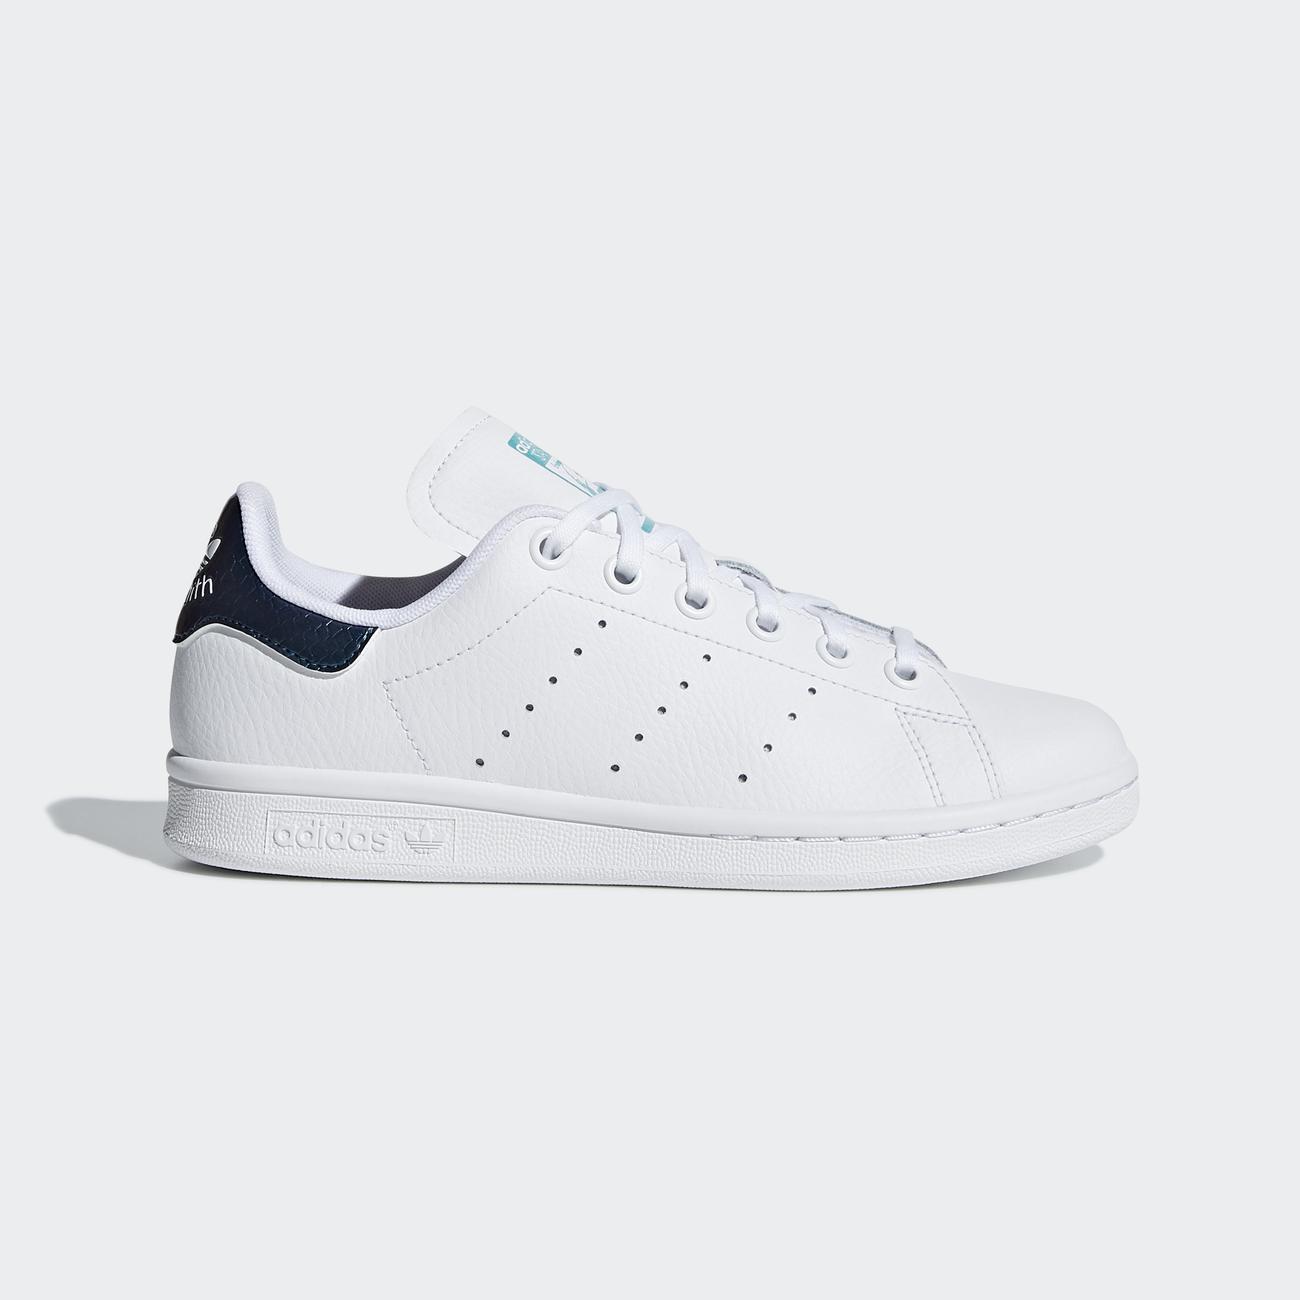 Adidas Originals STAN SMITH Adidas Originals  Junior  18/19